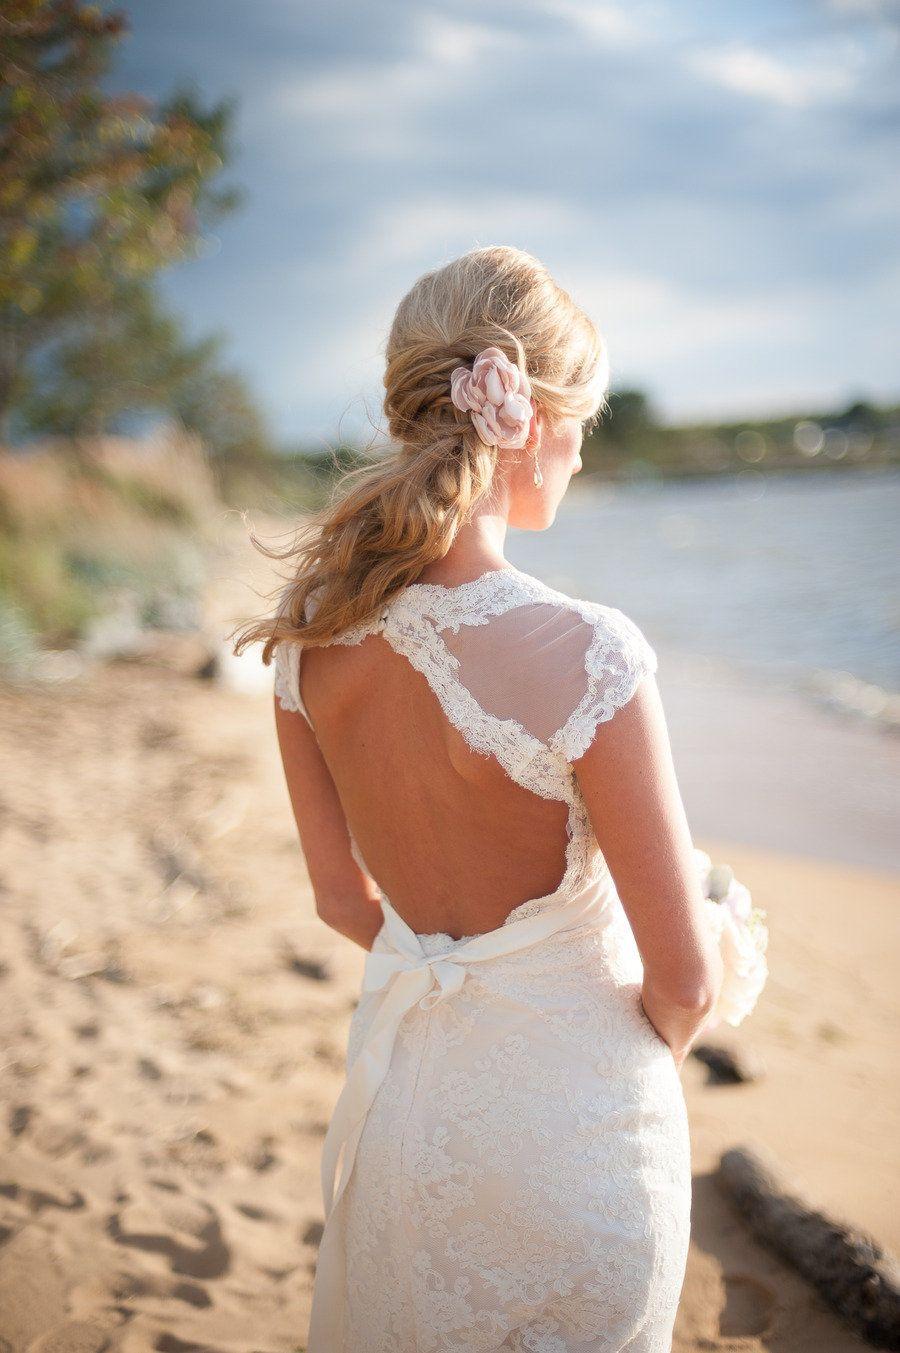 Maryland Wedding from Meaghan Elliott Photography | Brautkleider ...